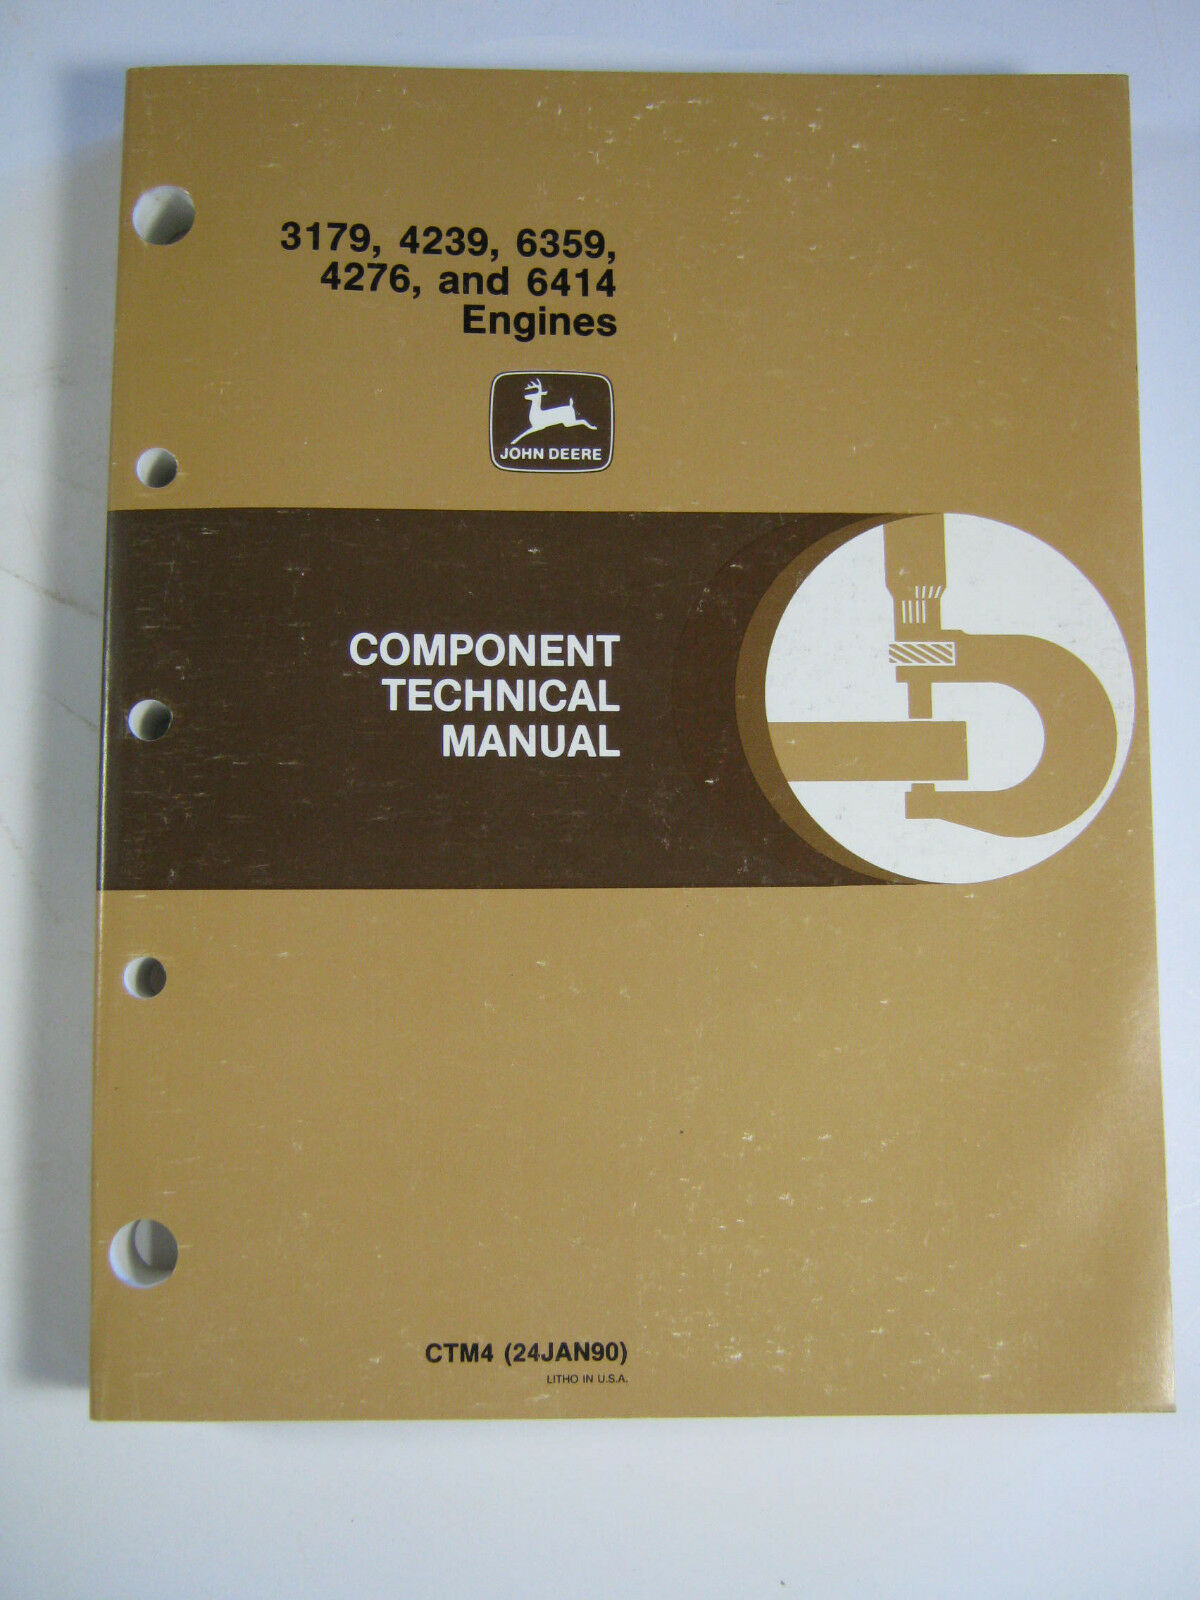 john deere component technical manual 3179 4239 6359 4276 6414 rh ebay com John Deere 400 John Deere 458